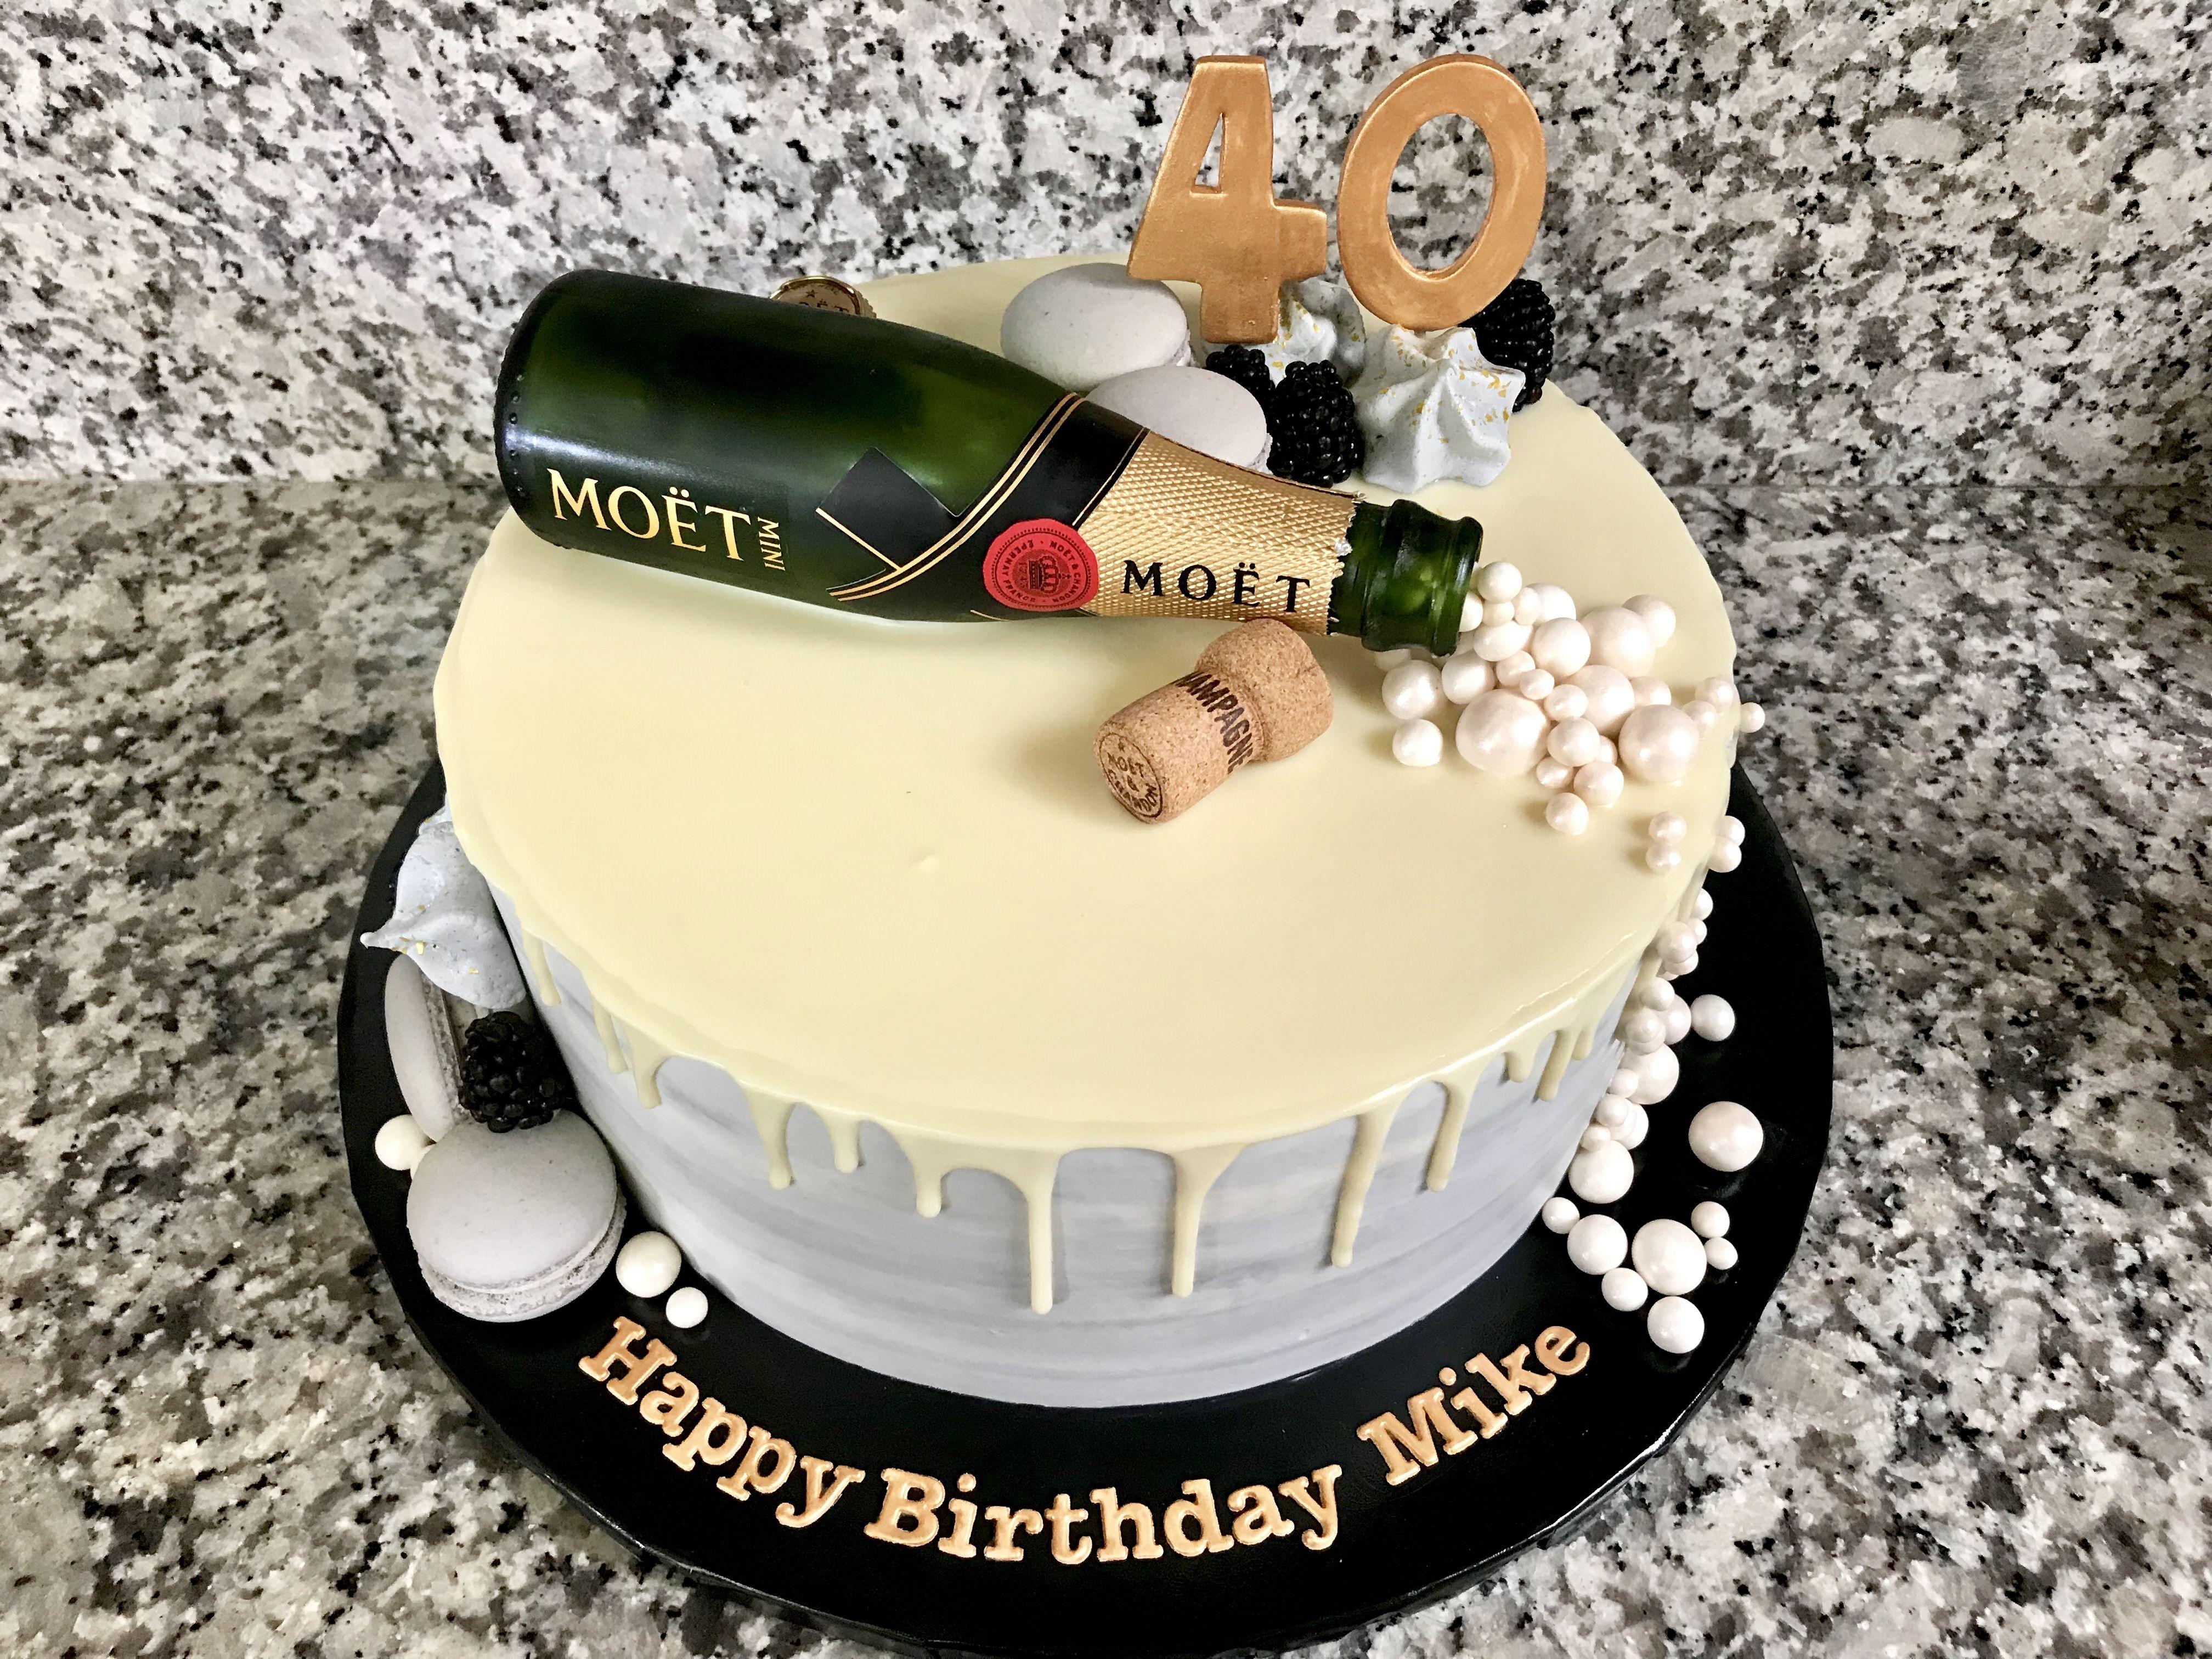 Moet Champagne Cake Birthday Cake Wine Champagne Cake Design Alcohol Birthday Cake